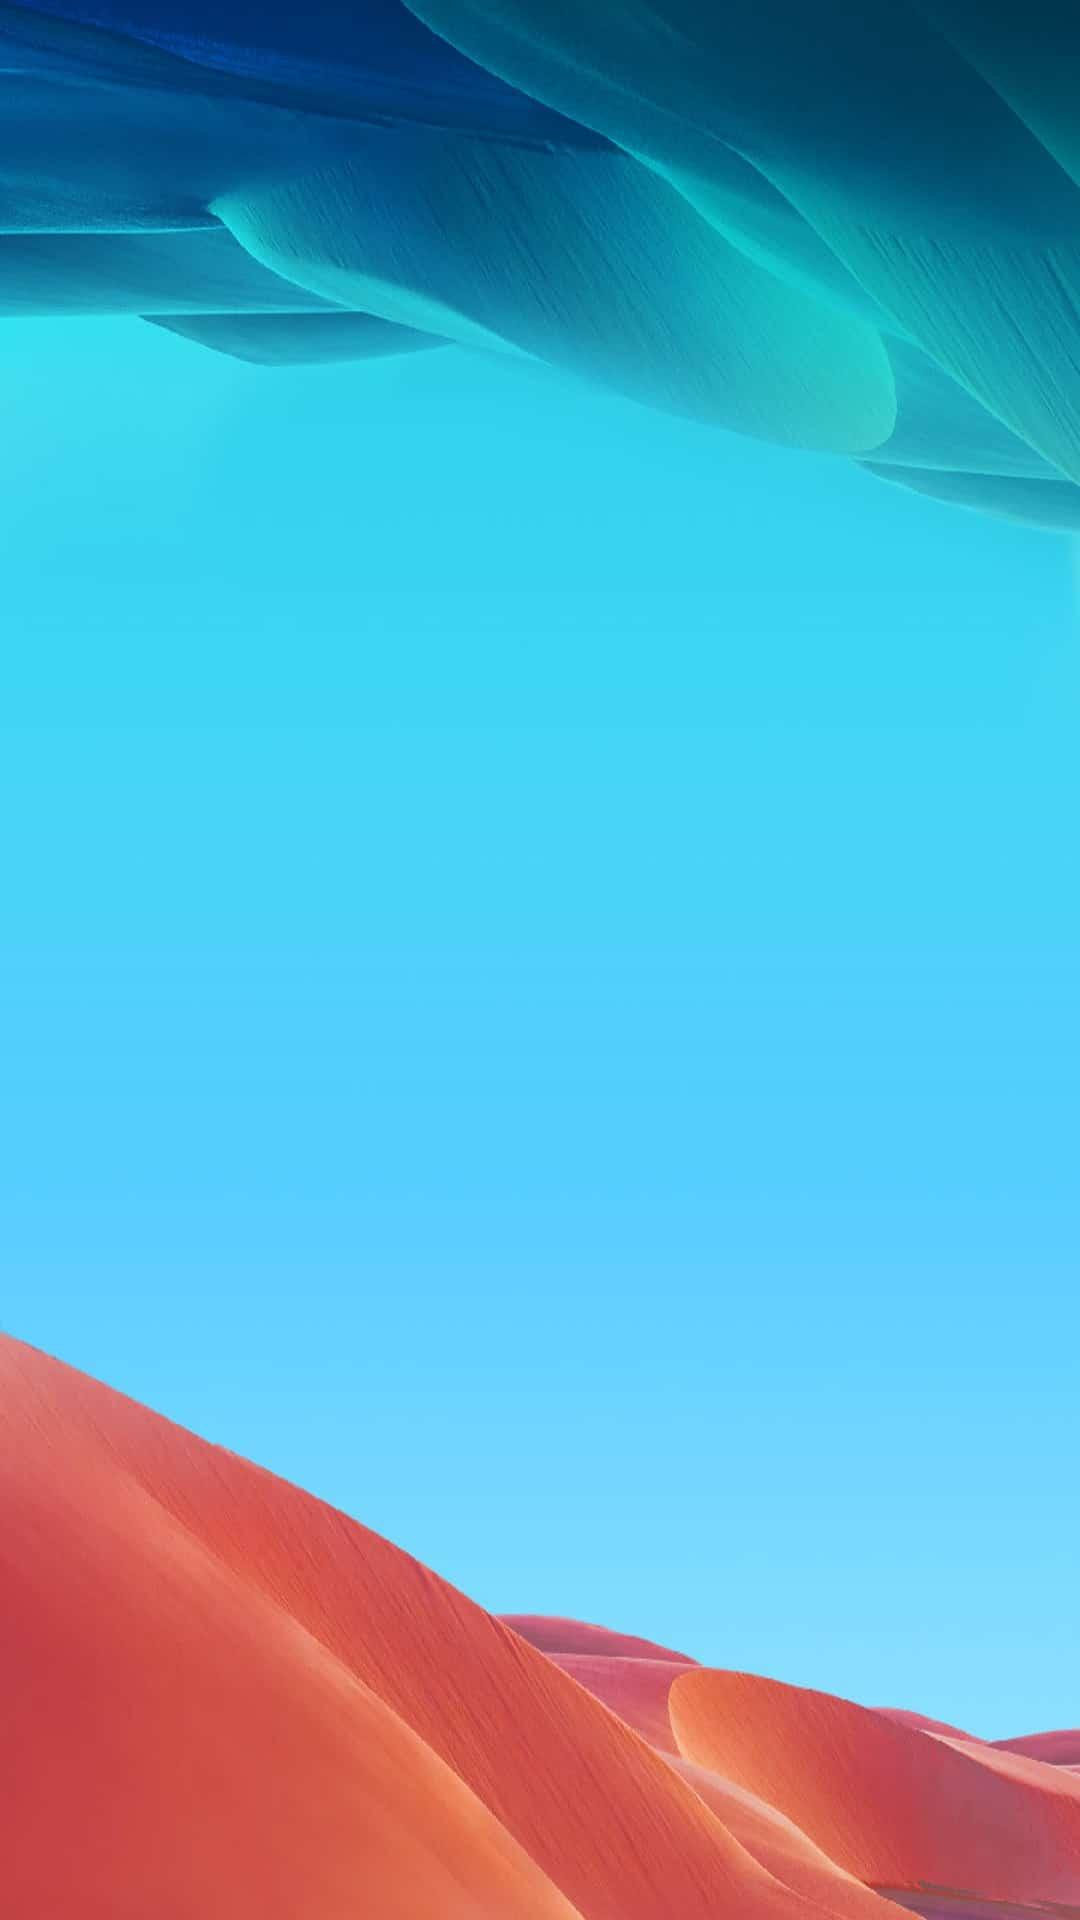 Download Samsung Galaxy M20 Wallpapers Fhd Qhd Droidviews